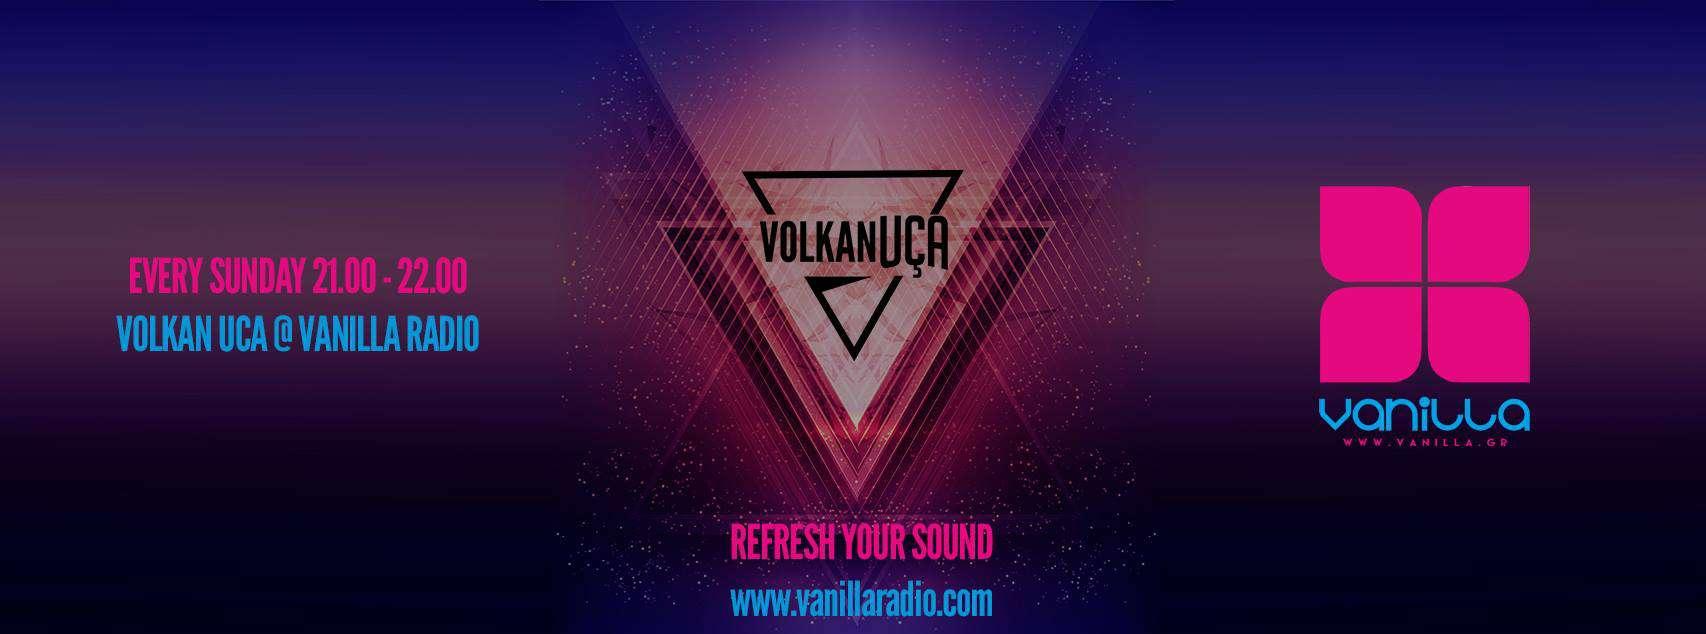 Vanilla Radio Welcomes DJ VOLKAN UÇA